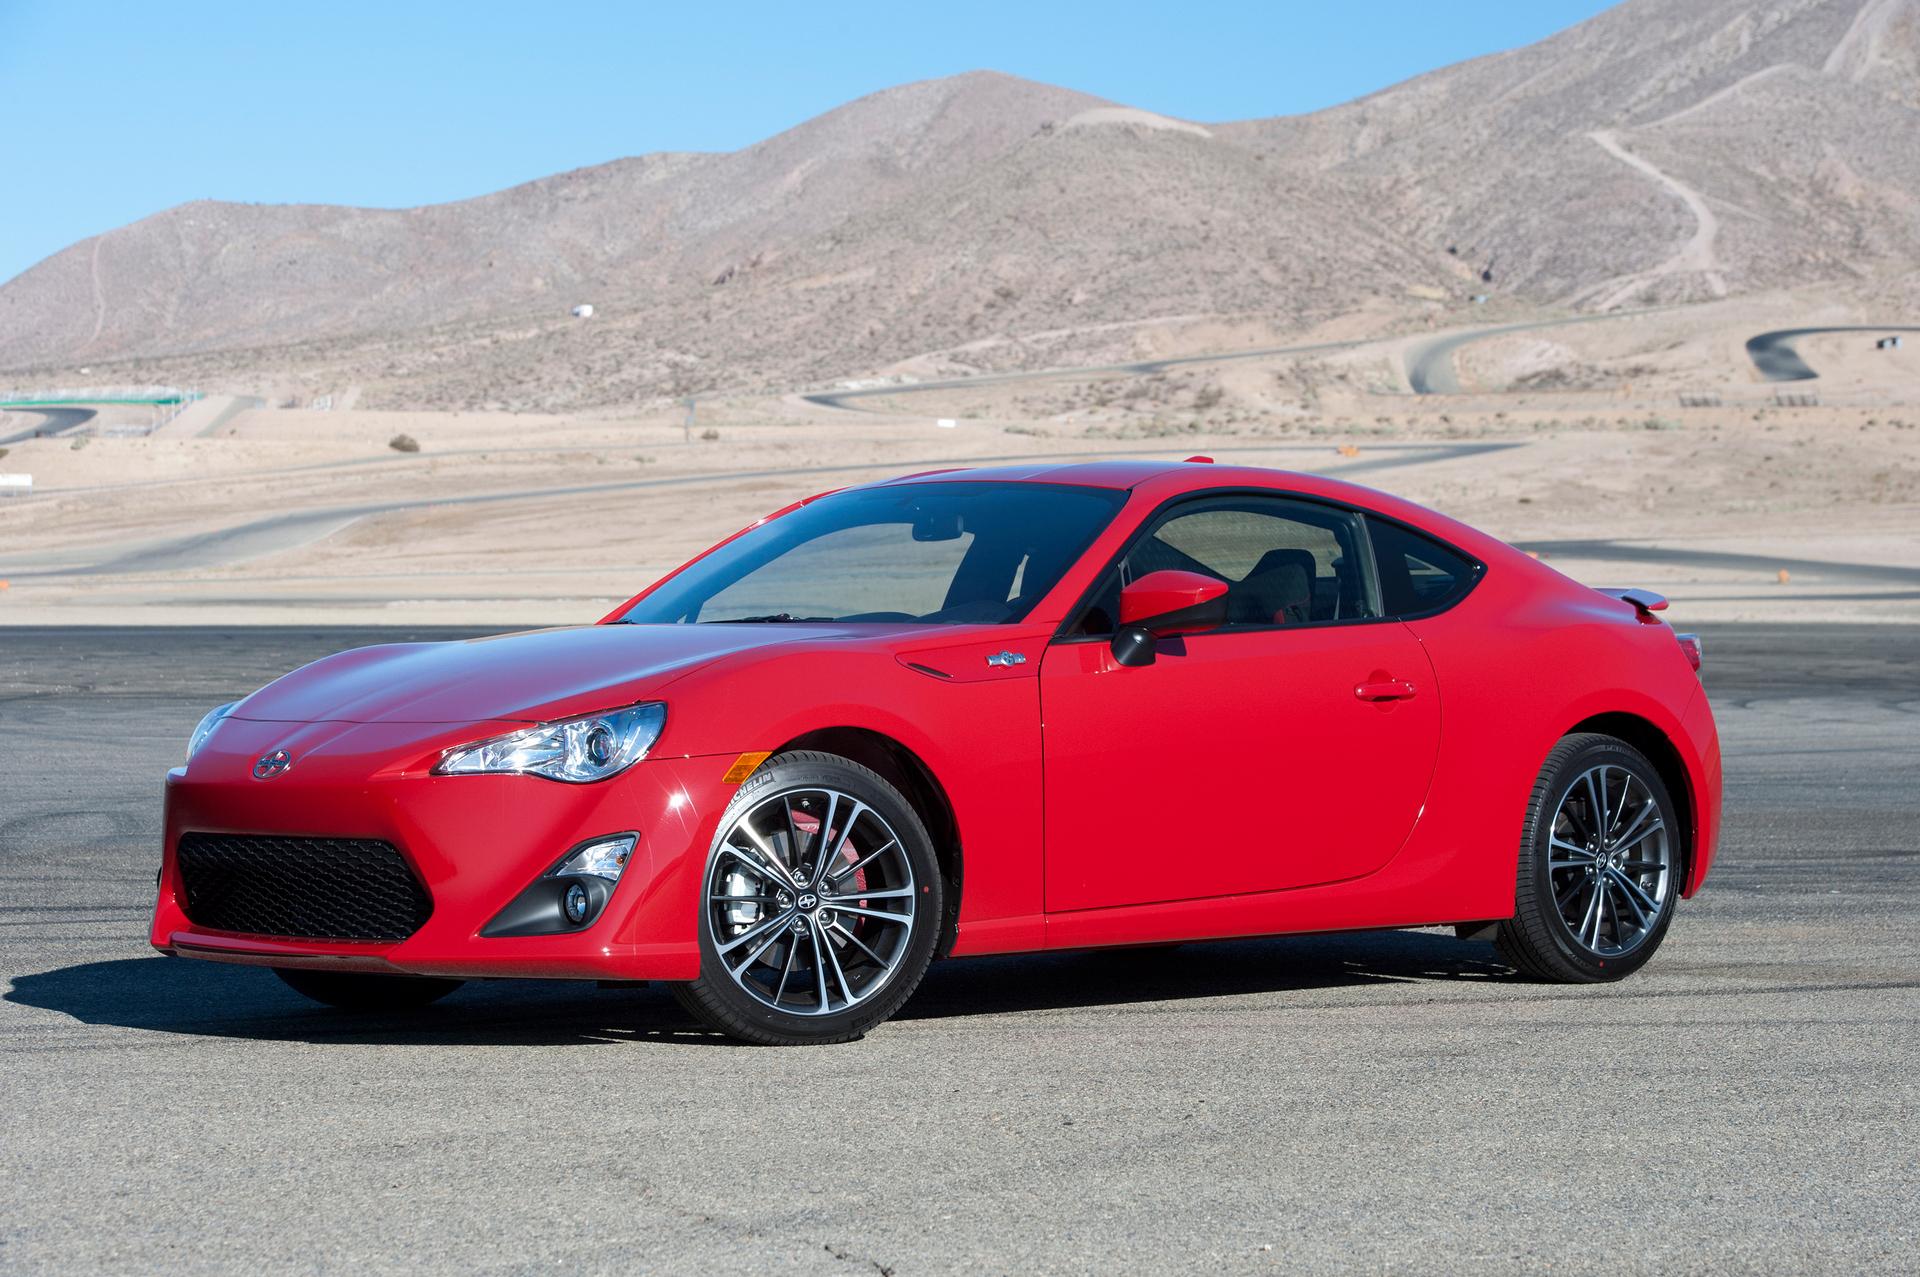 2015 Scion FRS © Toyota Motor Corporation